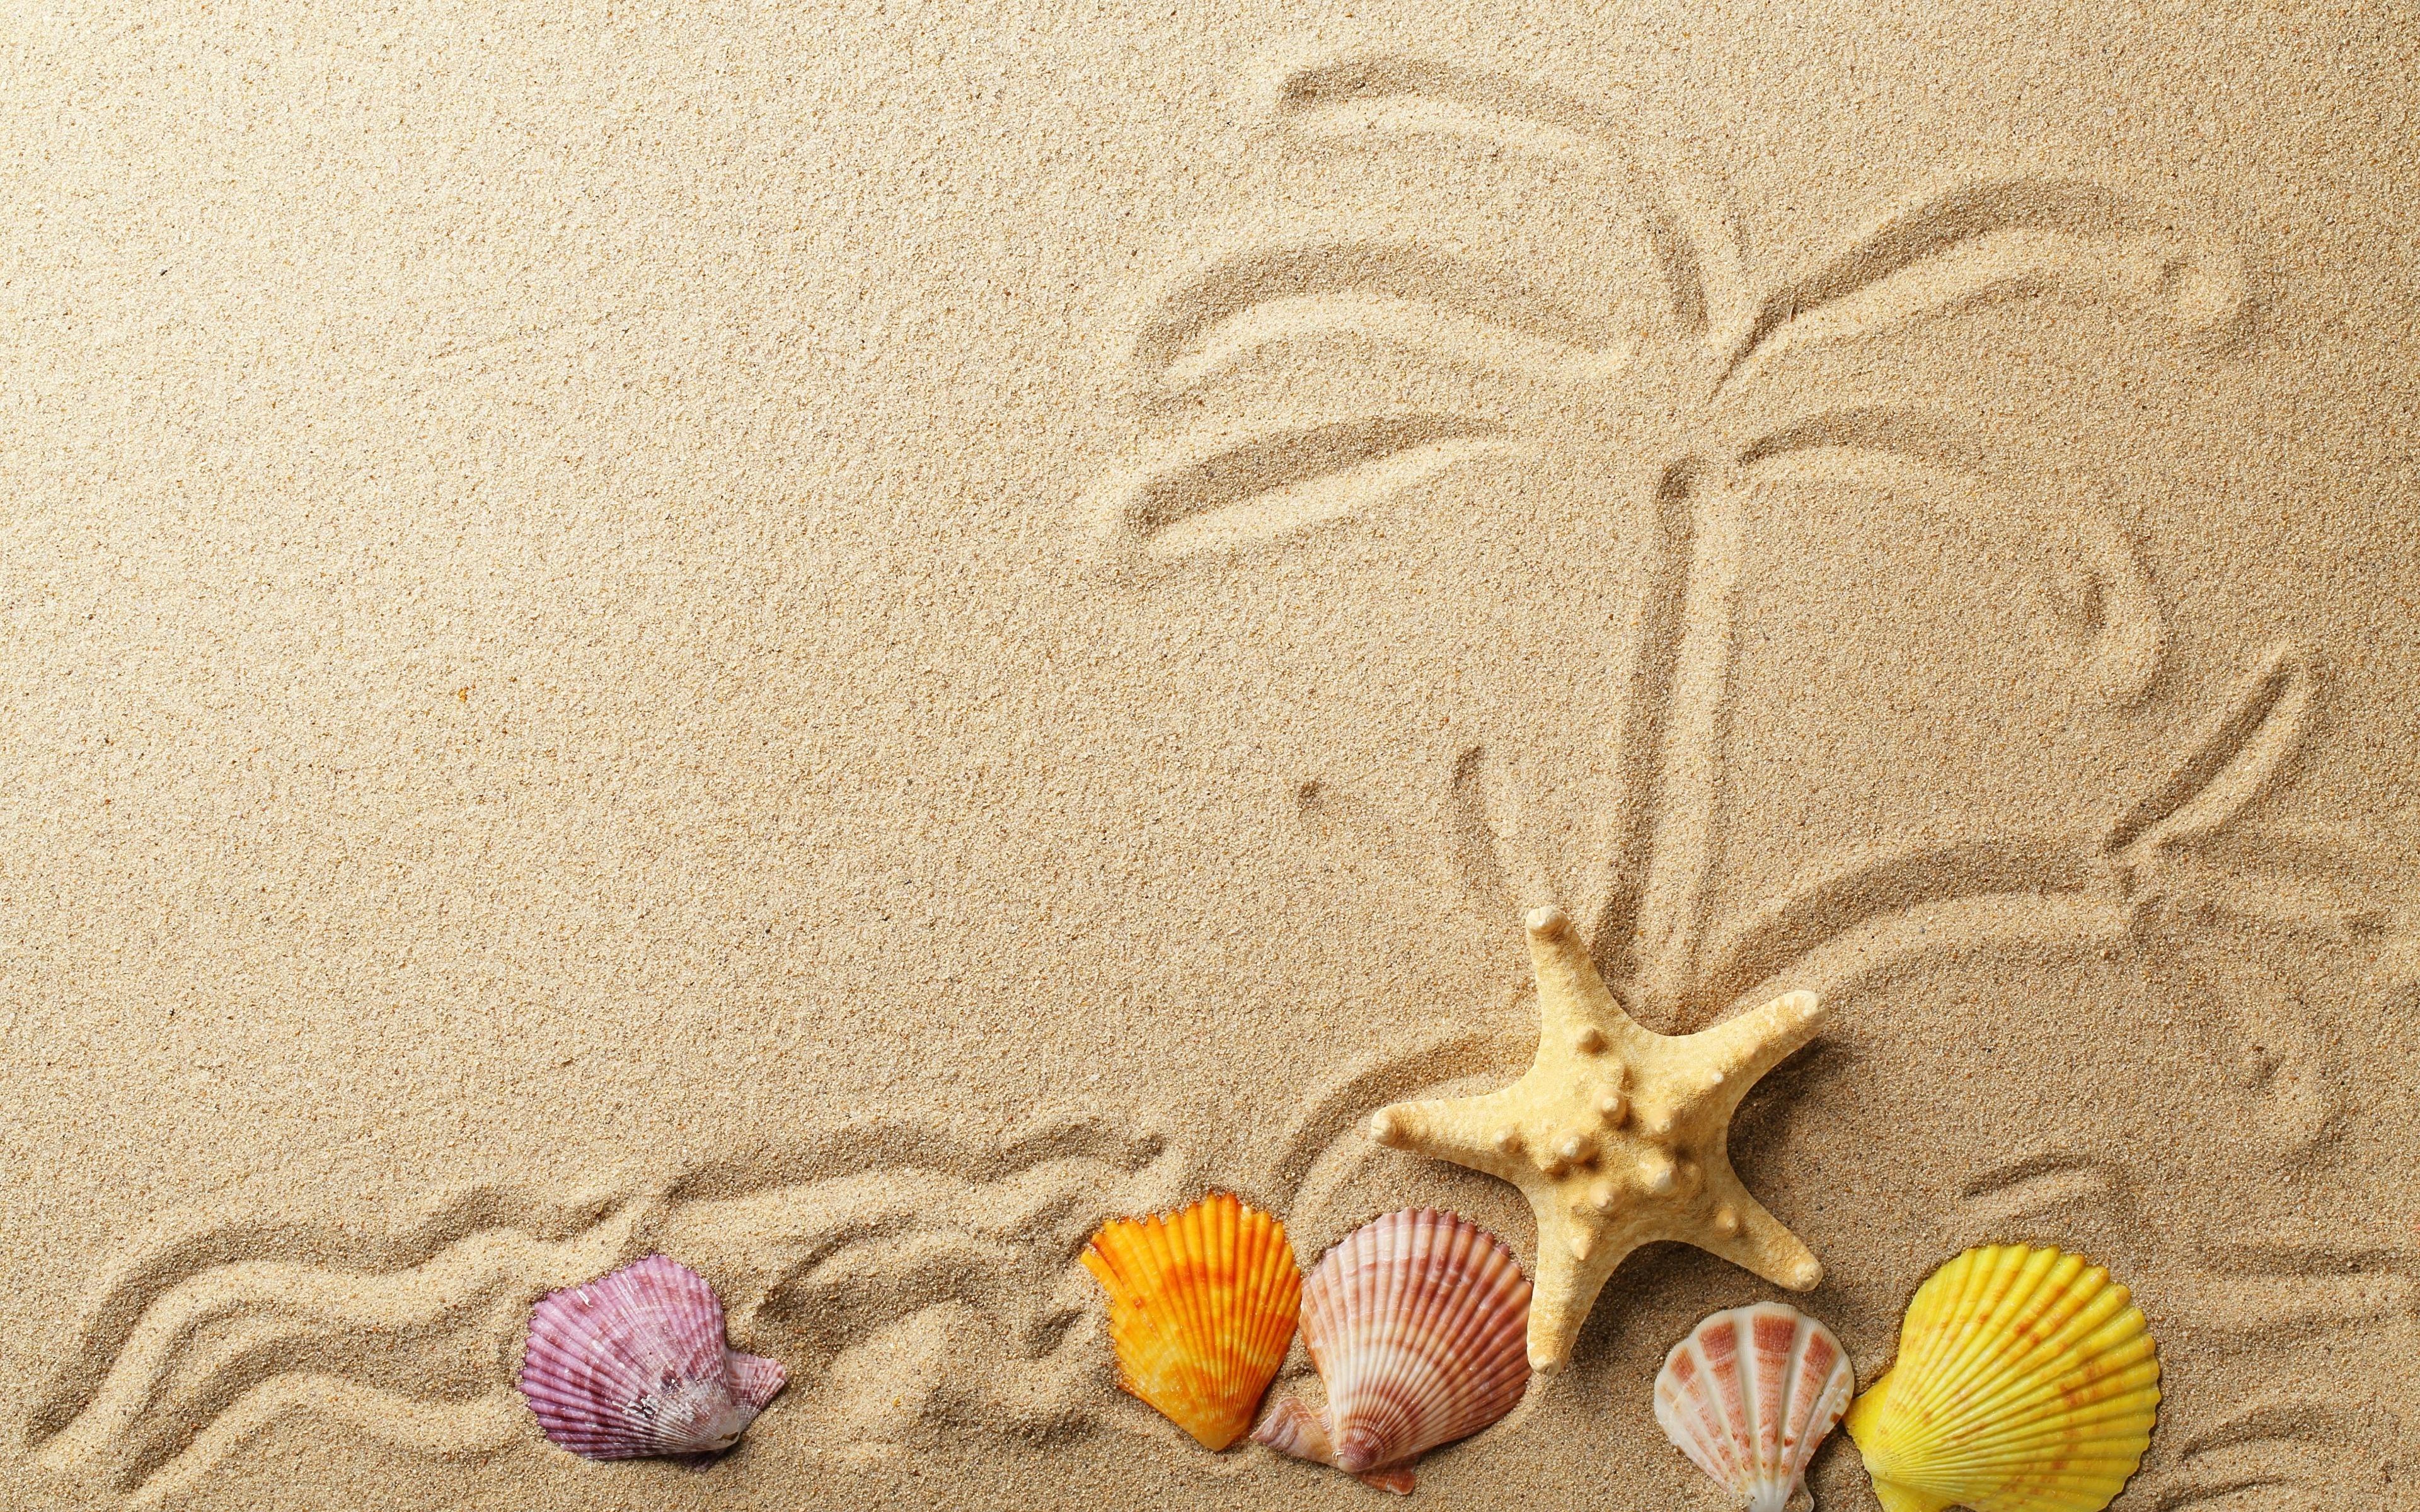 Картинки Морские звезды песка Ракушки 3840x2400 Песок песке